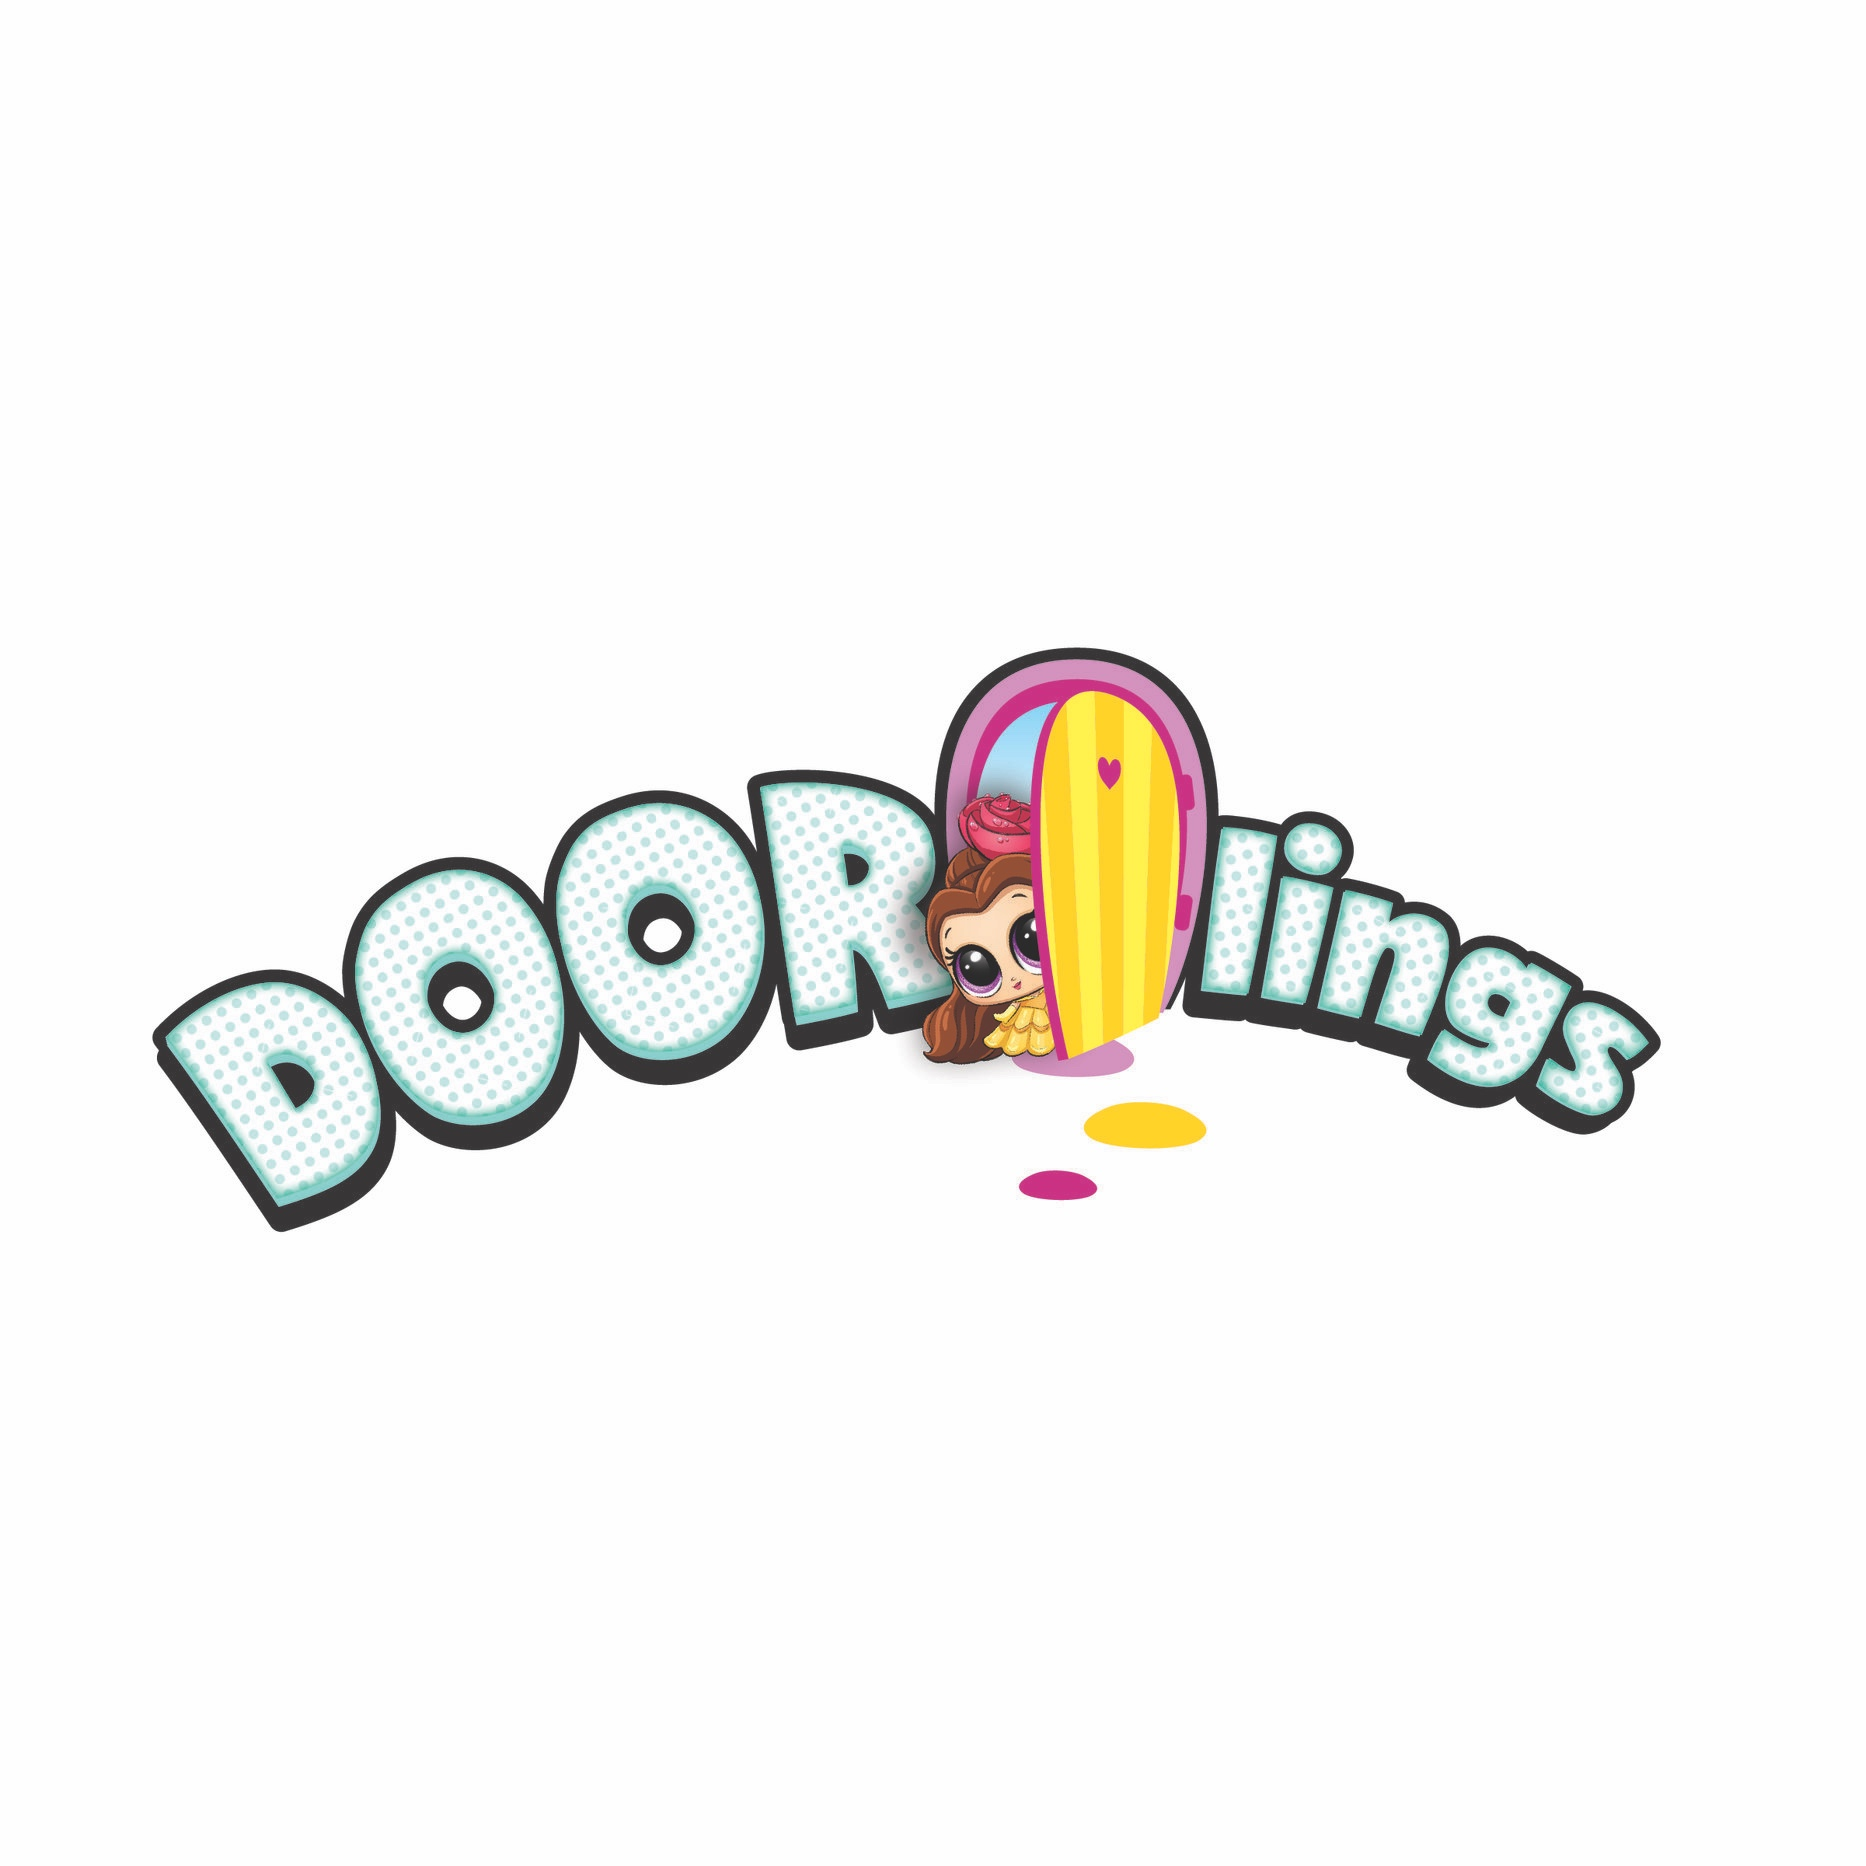 Doorlings logo for Moose Toys & Disney